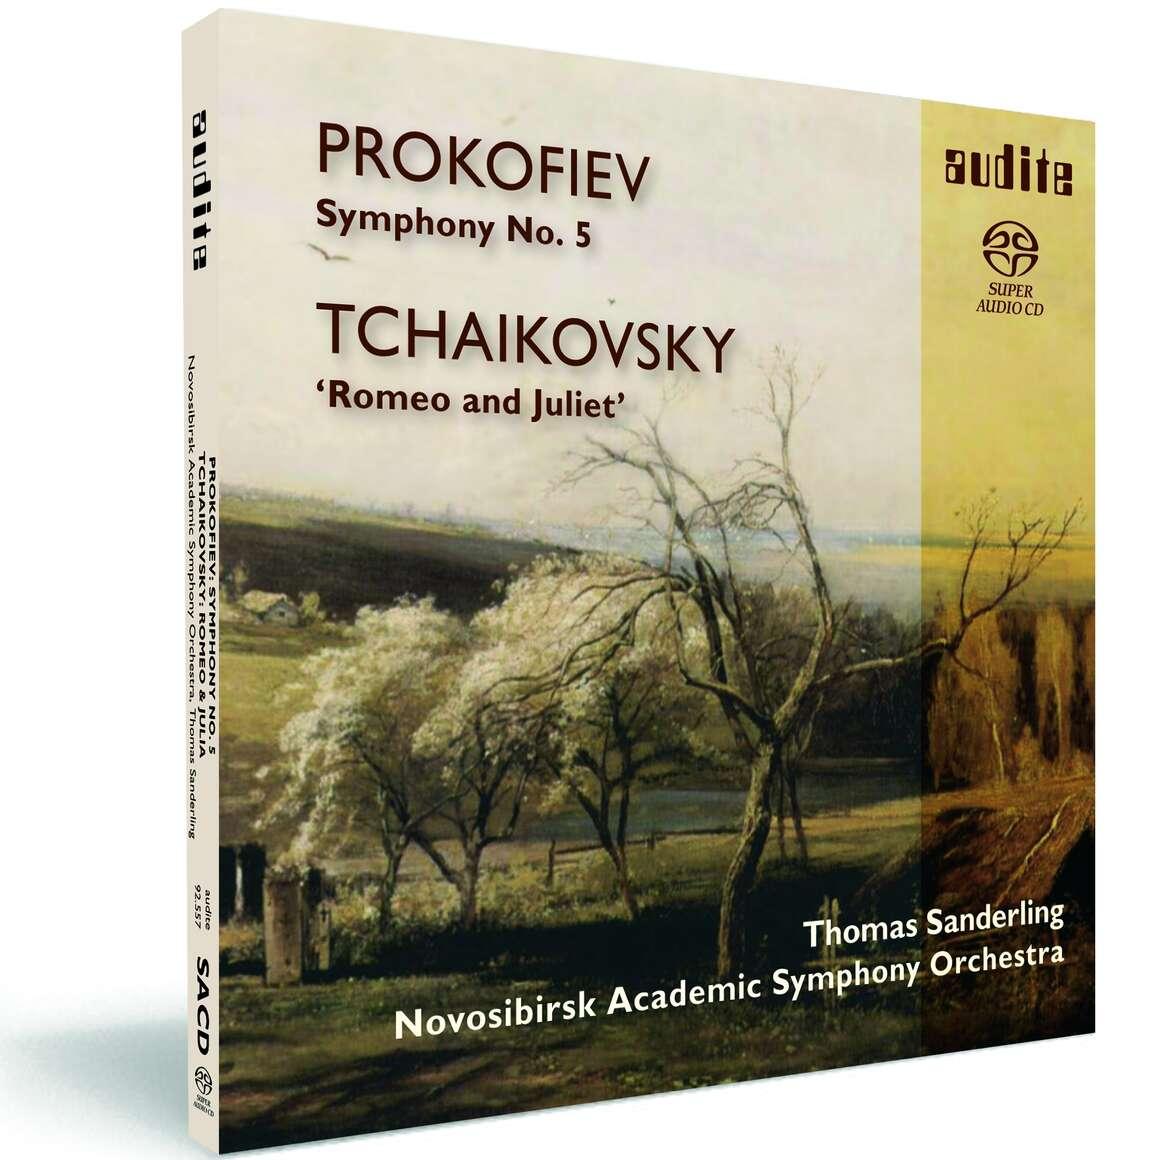 S. Prokofiev: Symphony No. 5 & P. Tchaikovsky: Romeo and Juliet